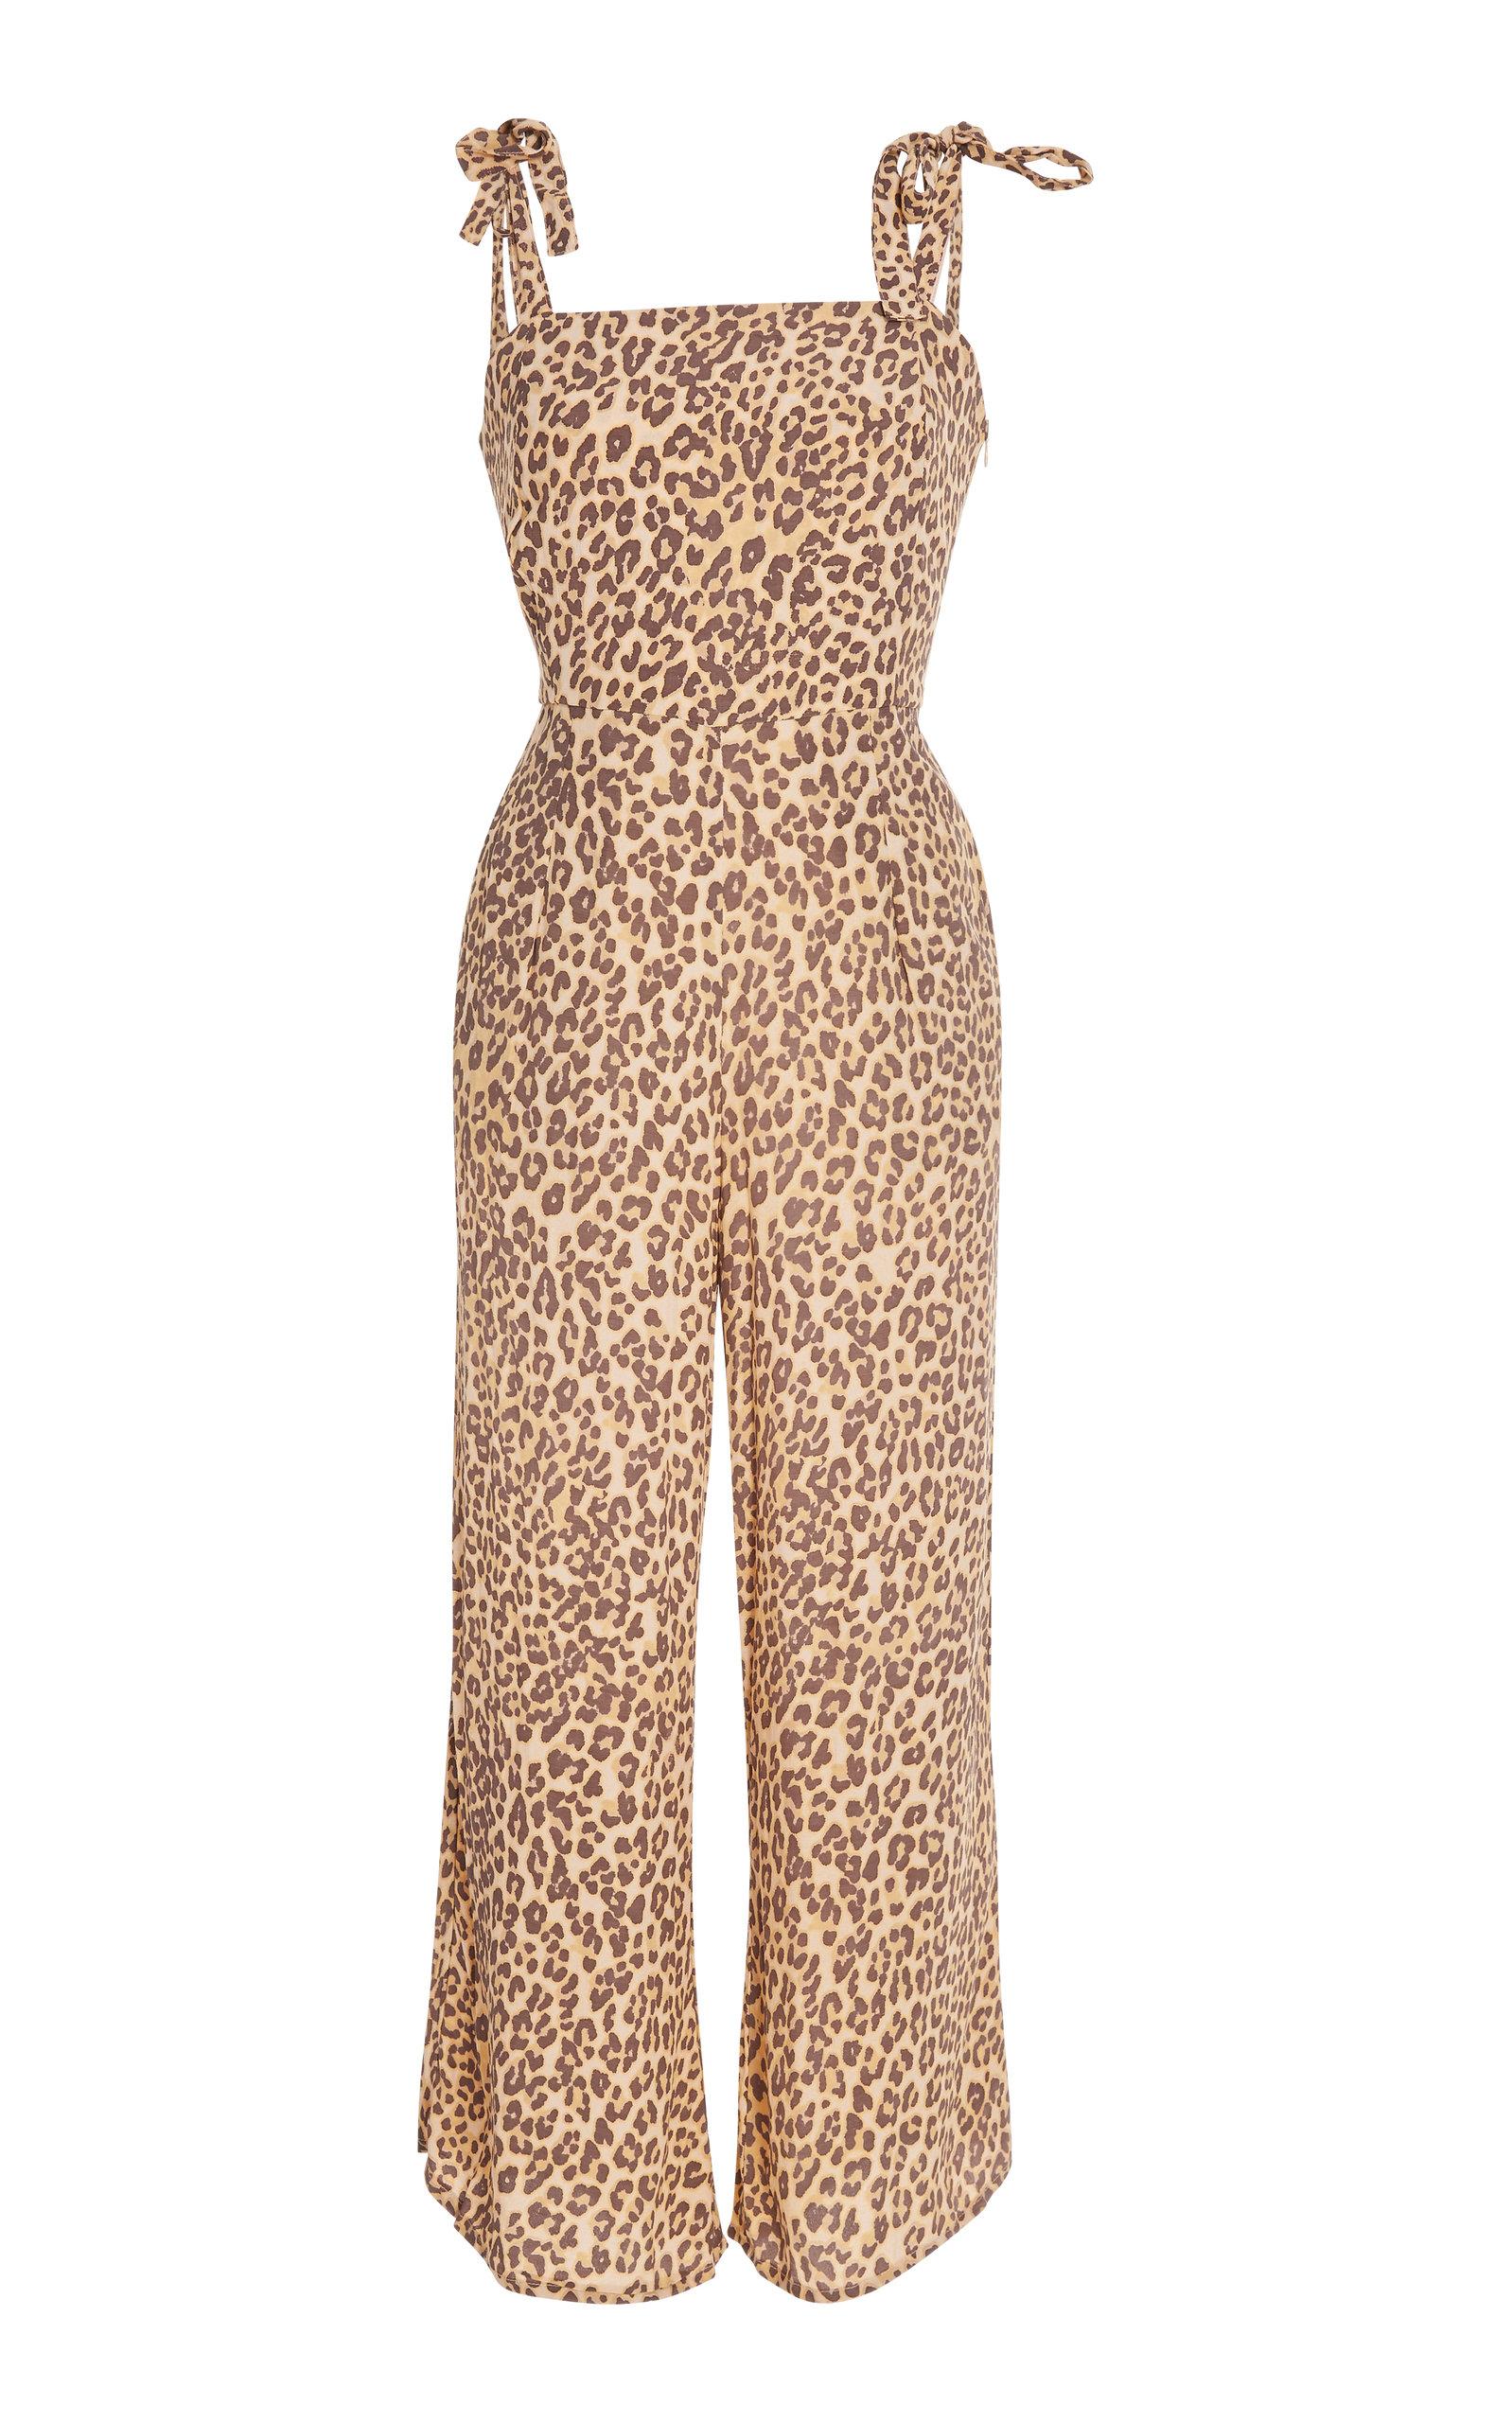 FAITHFULL THE BRAND | Faithfull The Brand Elsa Leopard-Print Voile Jumpsuit | Goxip